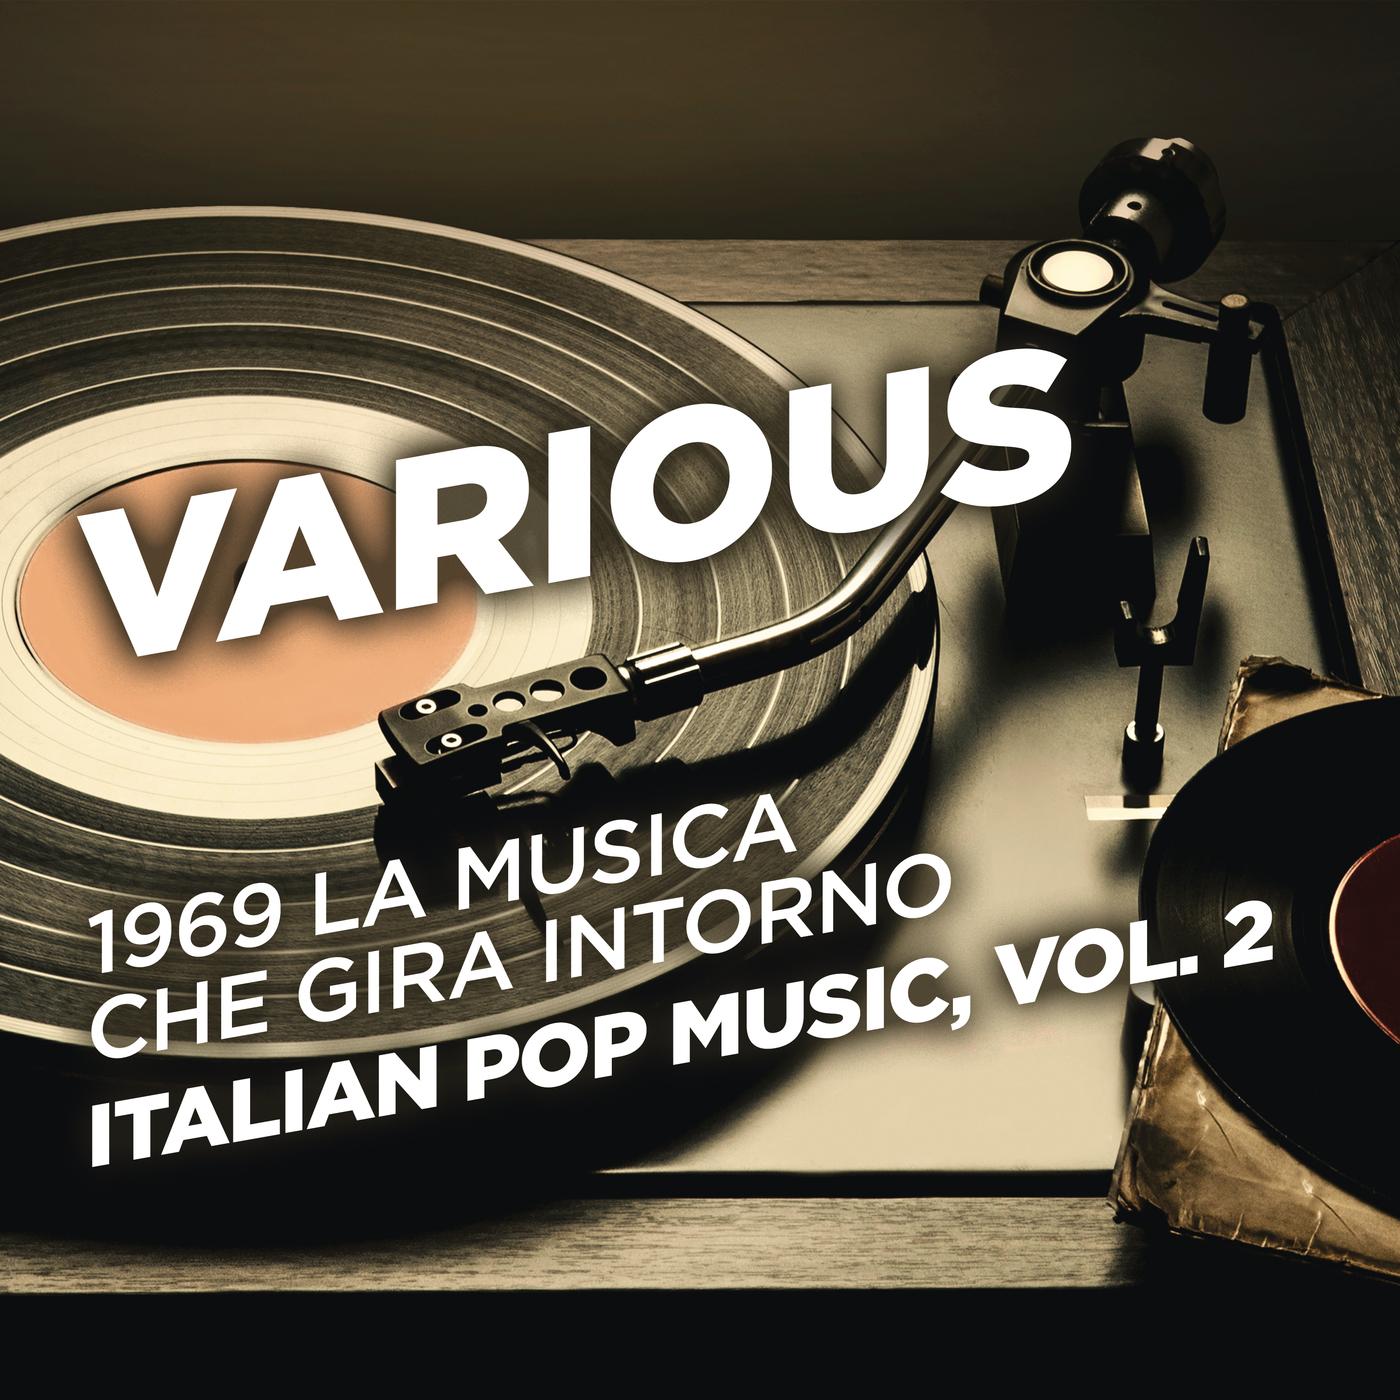 1969 La musica che gira intorno - Italian Pop Music, Vol. 2 - Various Artists